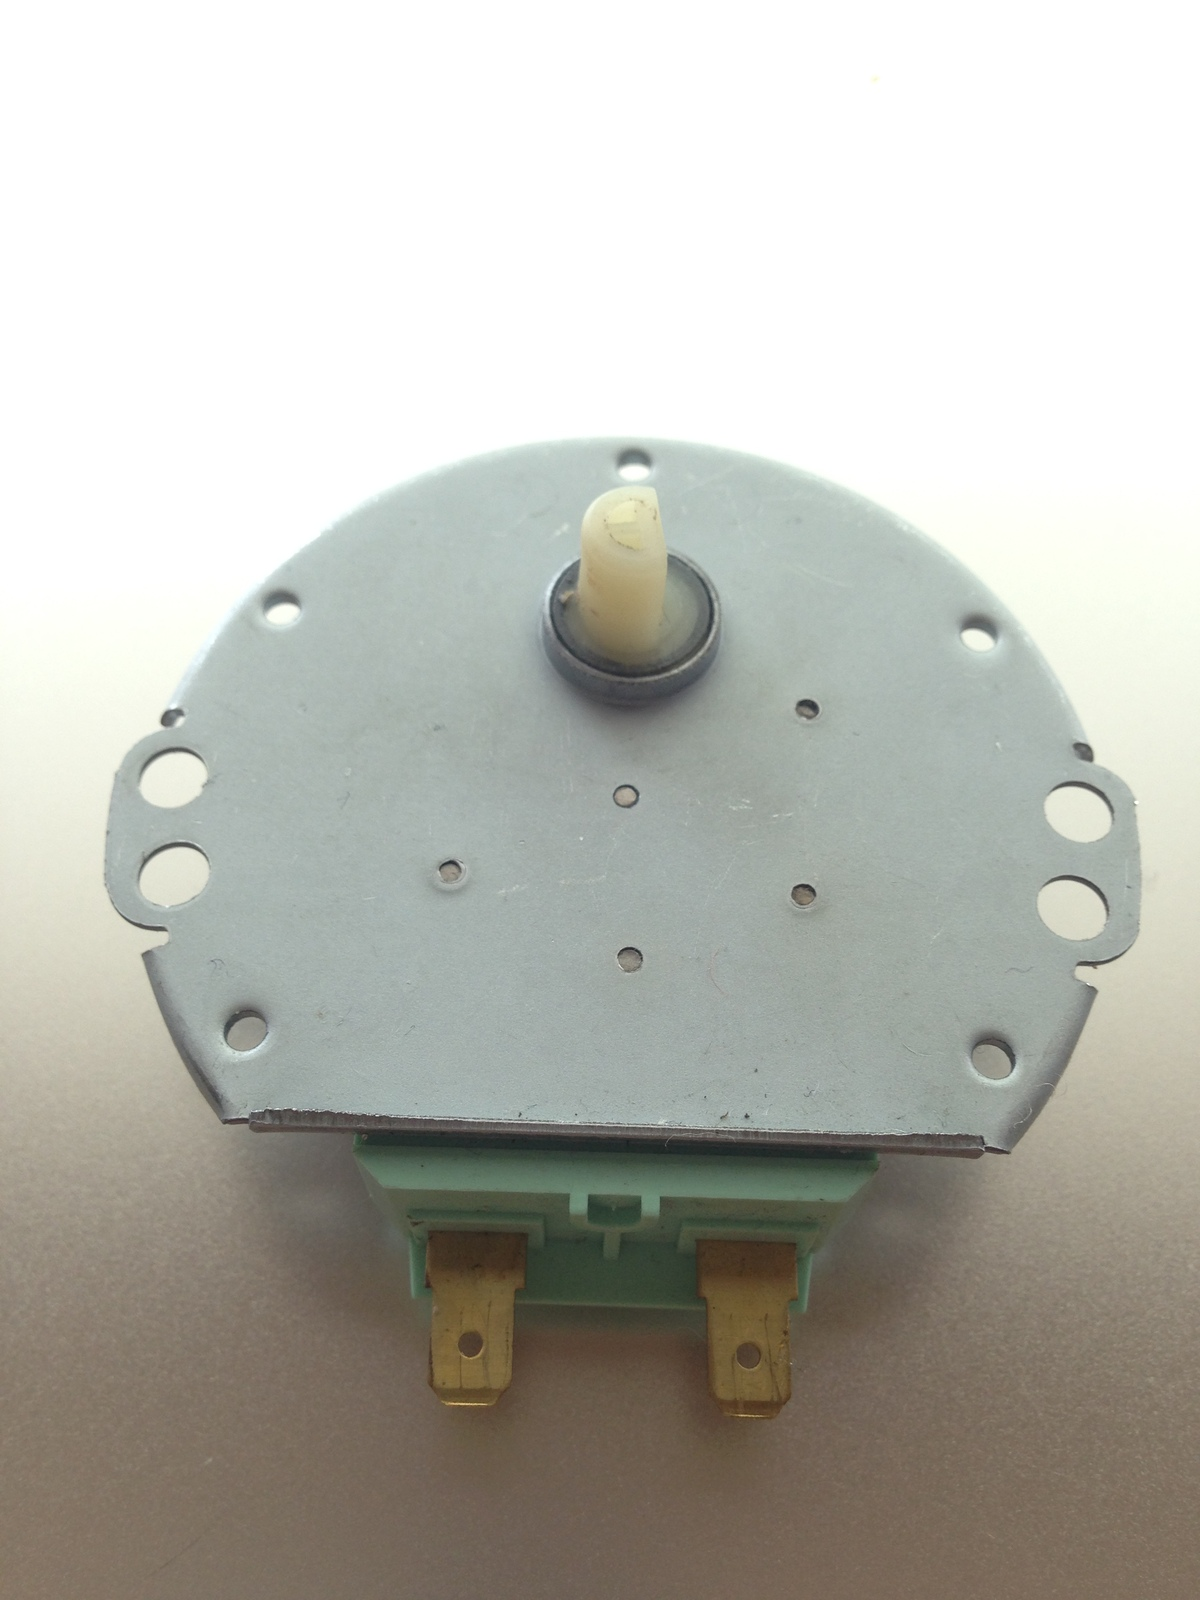 General electric microwave oem gm162f302 turntable motor for General electric motor parts